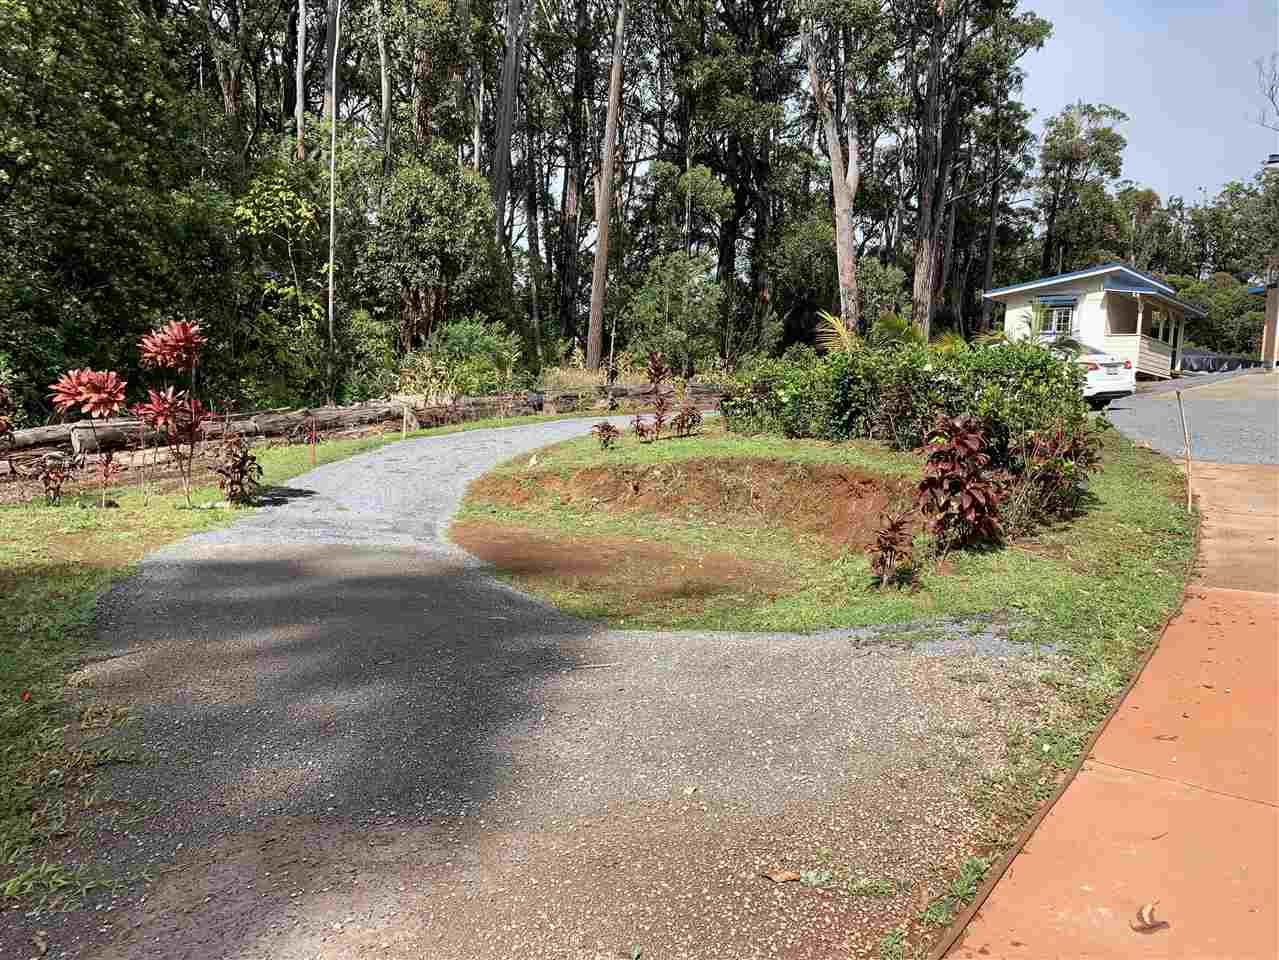 Photo of 1505 Piiholo Rd, Makawao, HI 96768 (MLS # 390909)